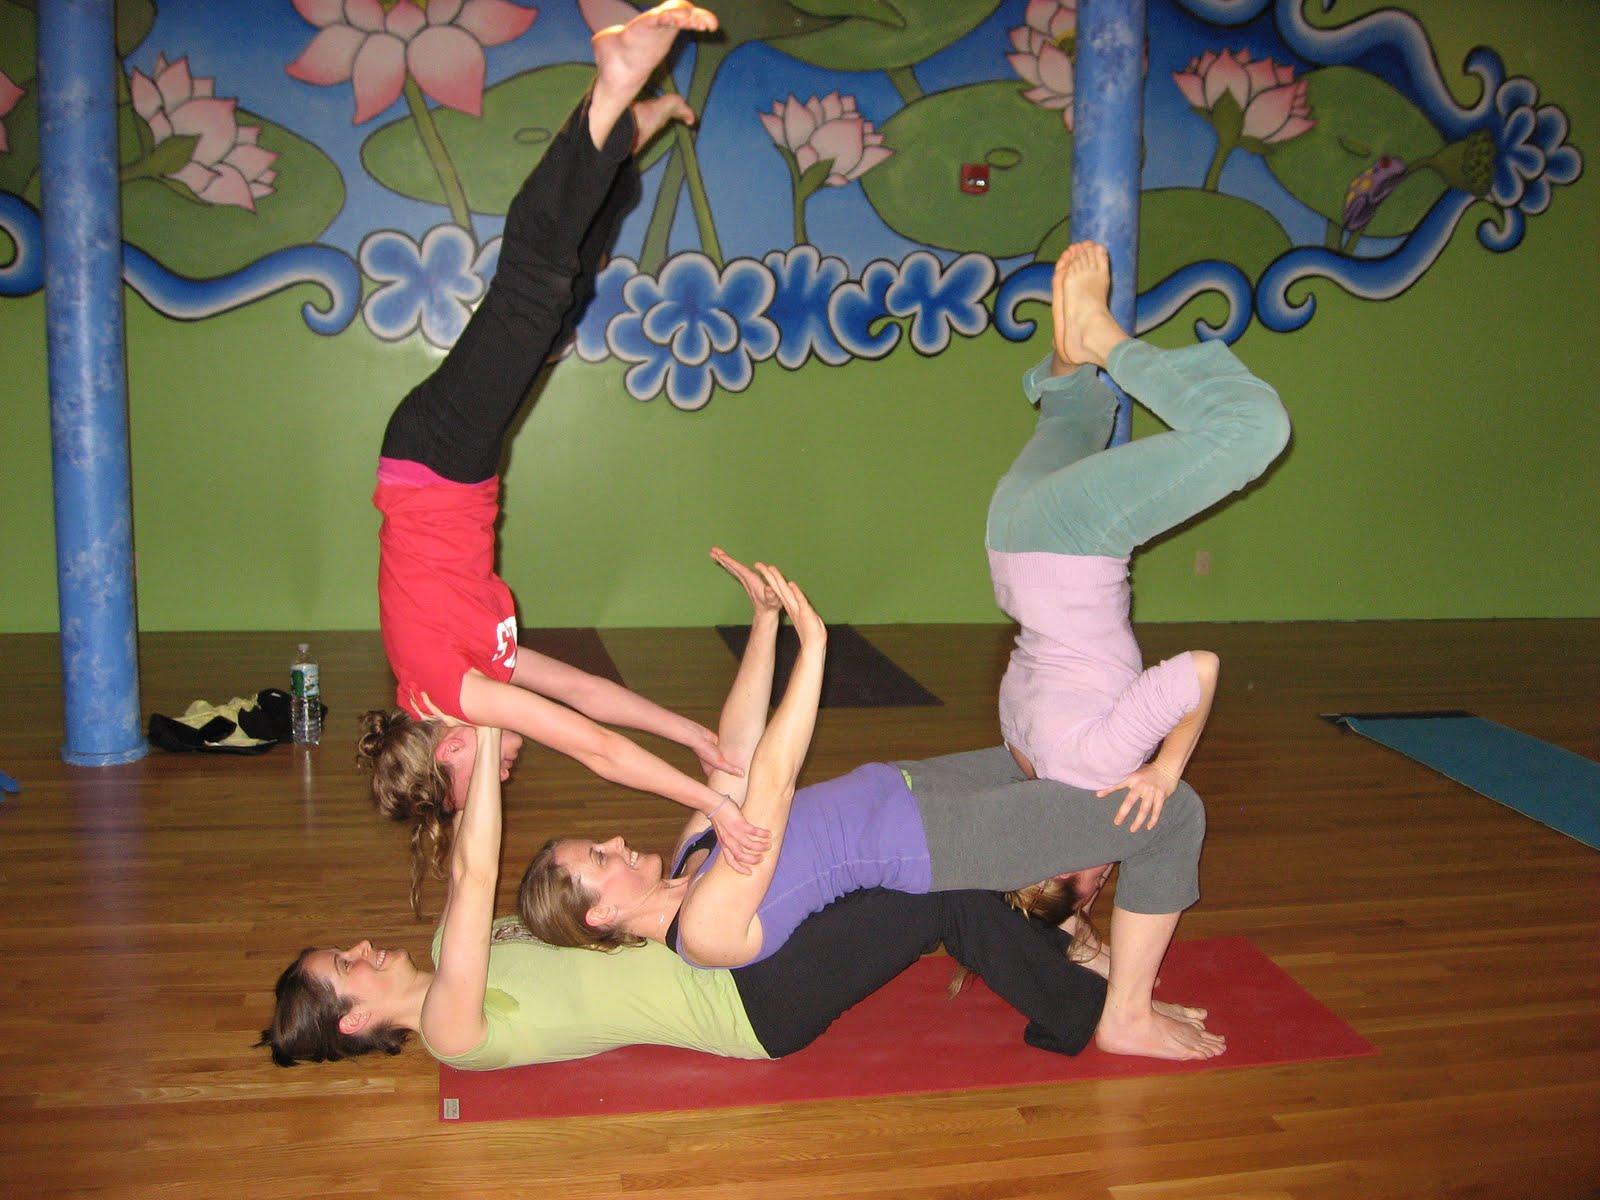 Bikram Yoga Forward To Back Poses Looking Spring The This Last Web Kripalu